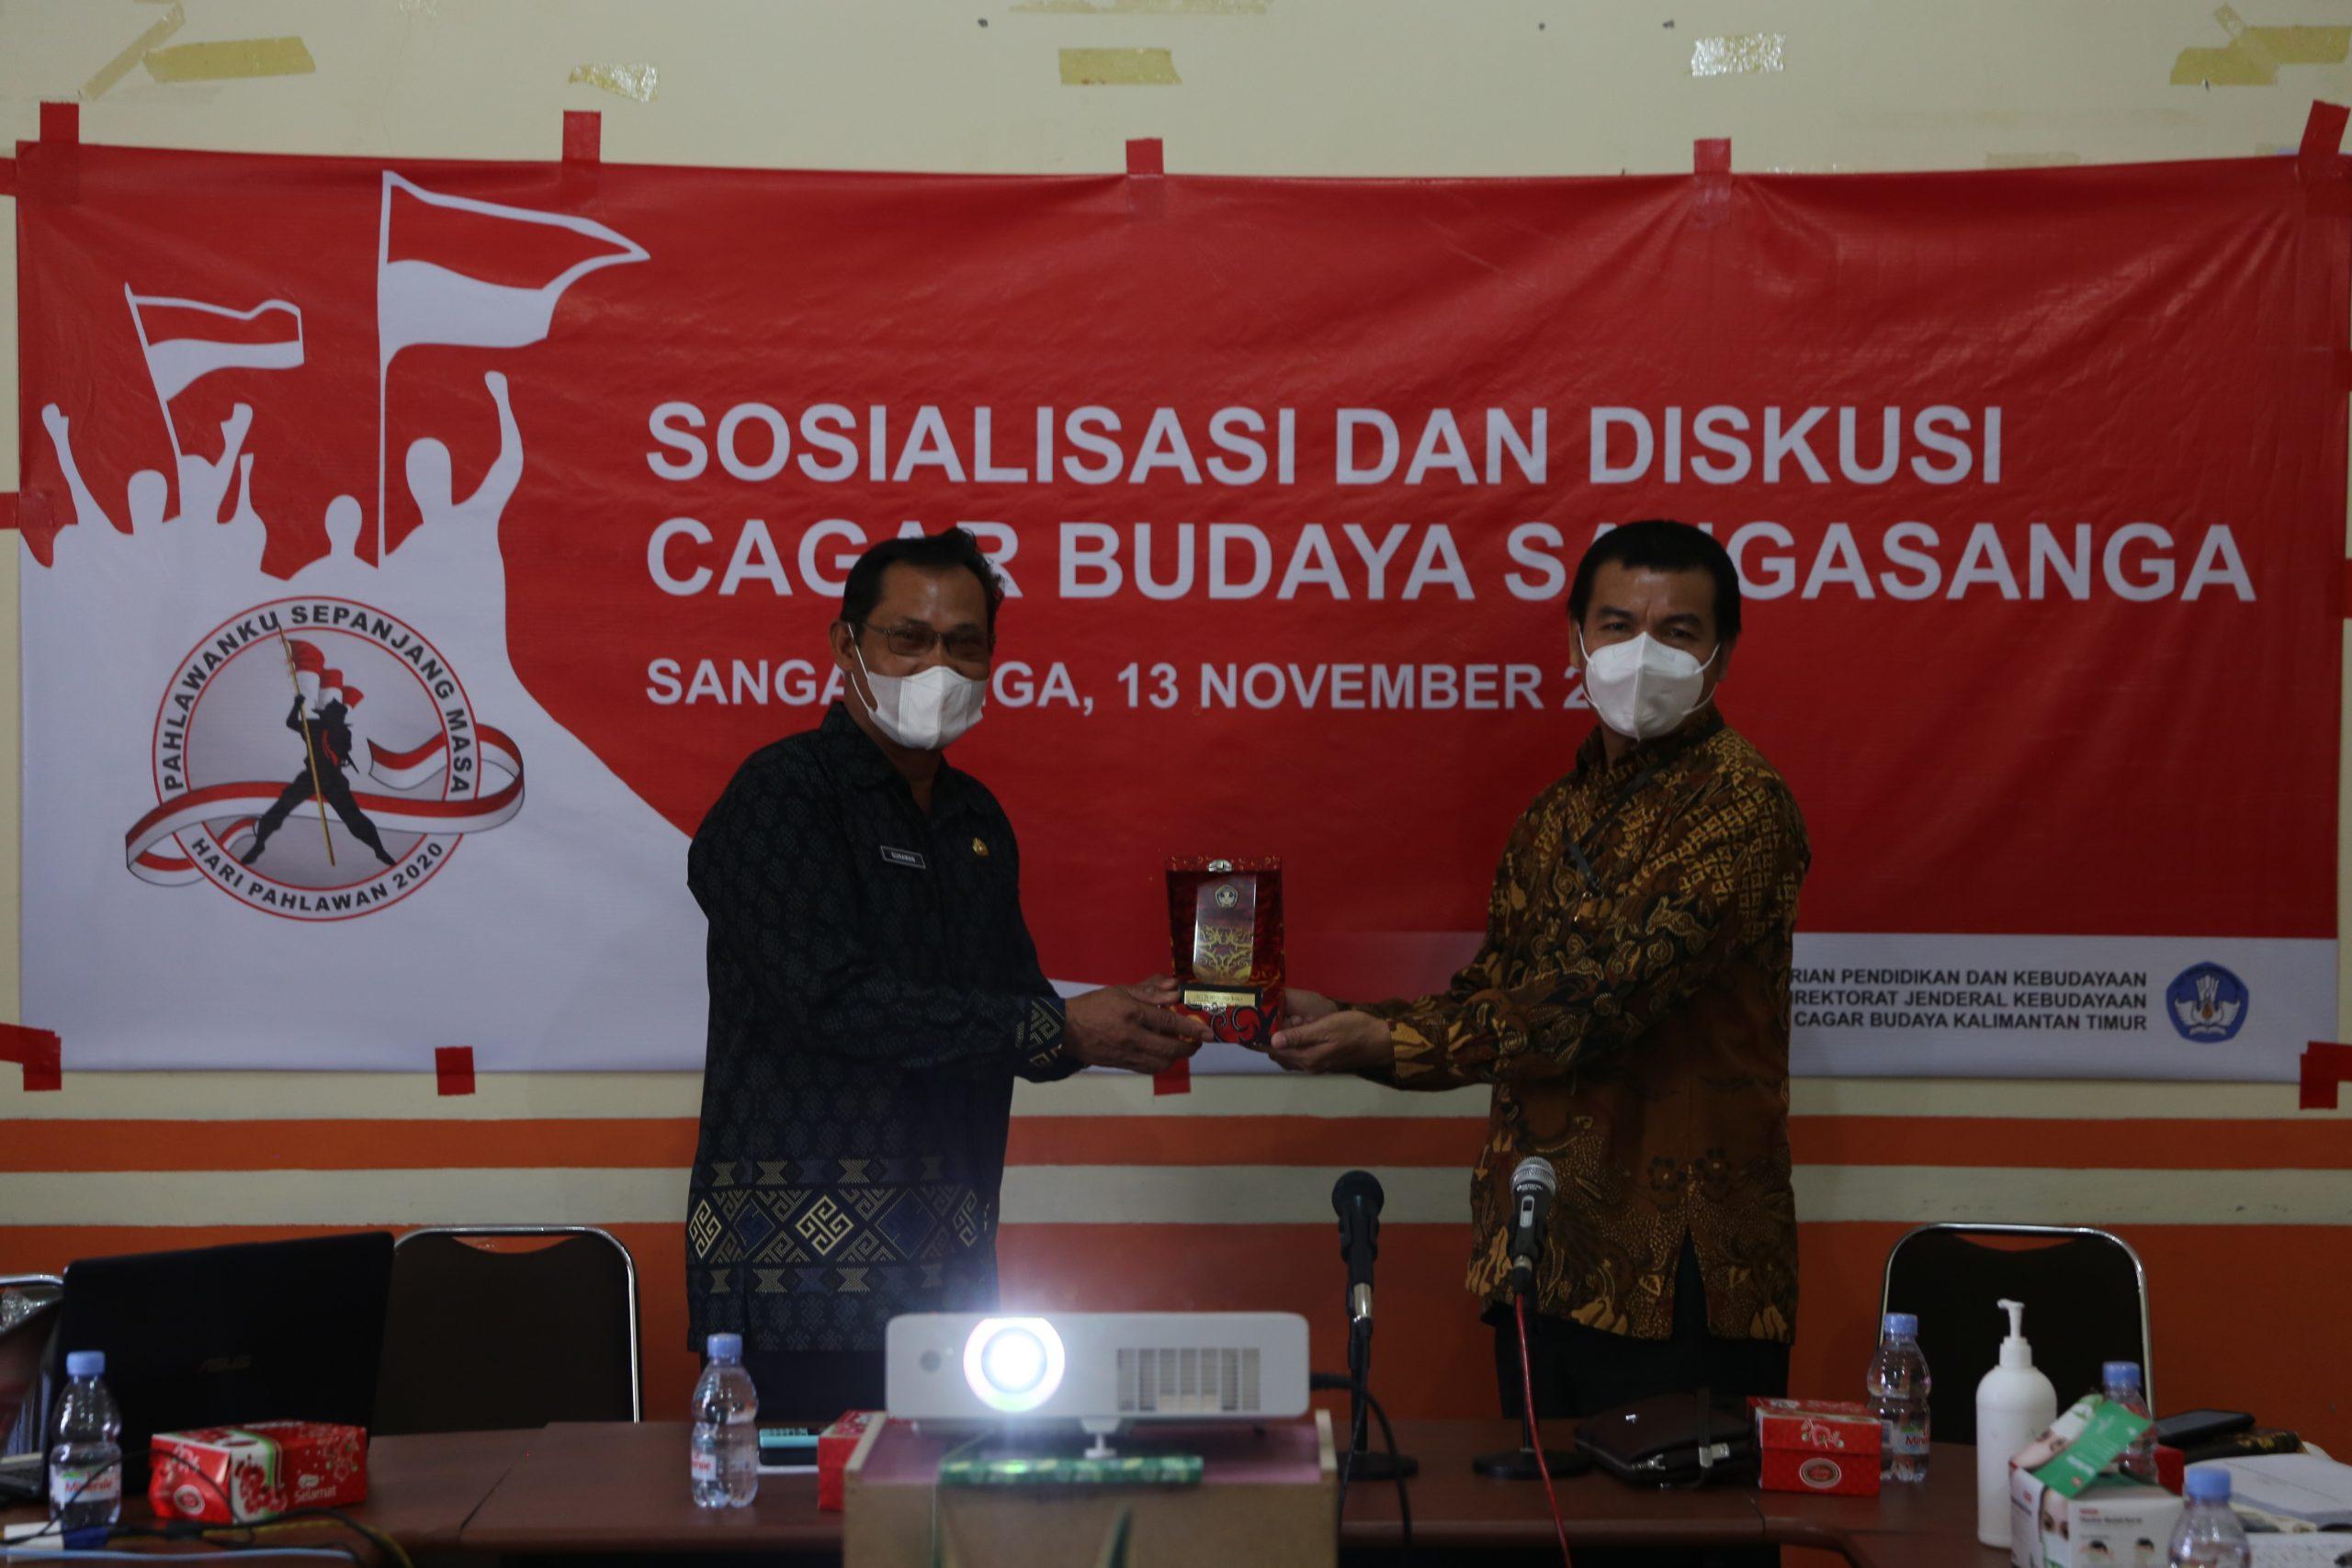 Sosialisasi dan Diskusi Cagar Budaya di Sangasanga